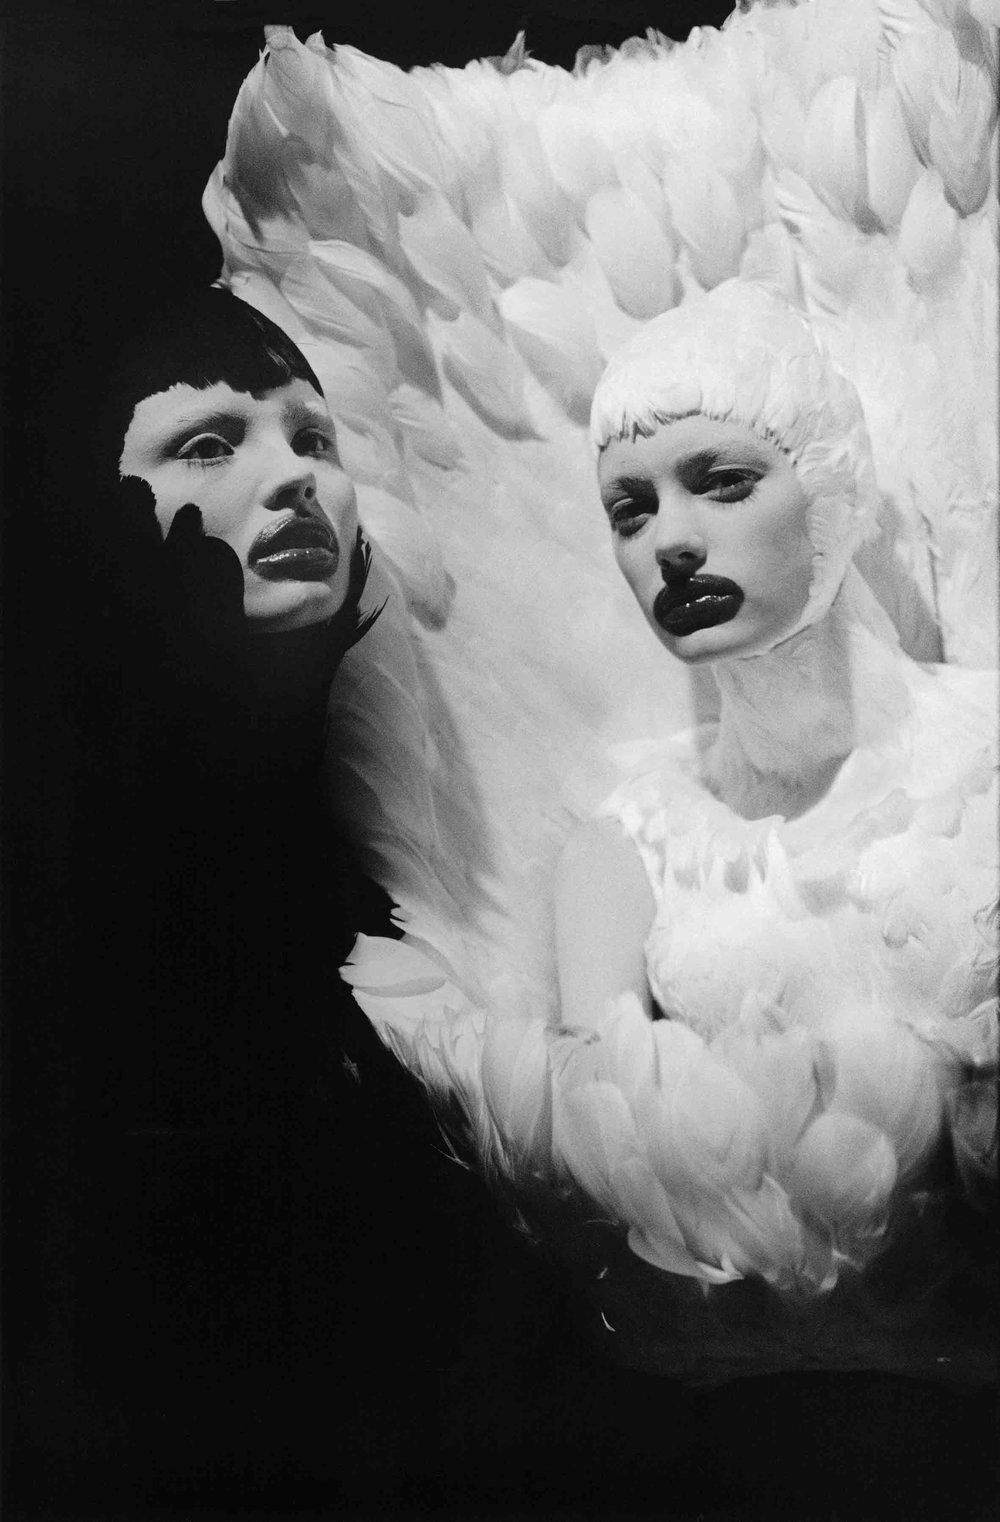 Ann Ray,  Unfallen Angels I , Paris, 2009 (The Horn of Plenty, Sigrid Agren). Courtesy of the artist.